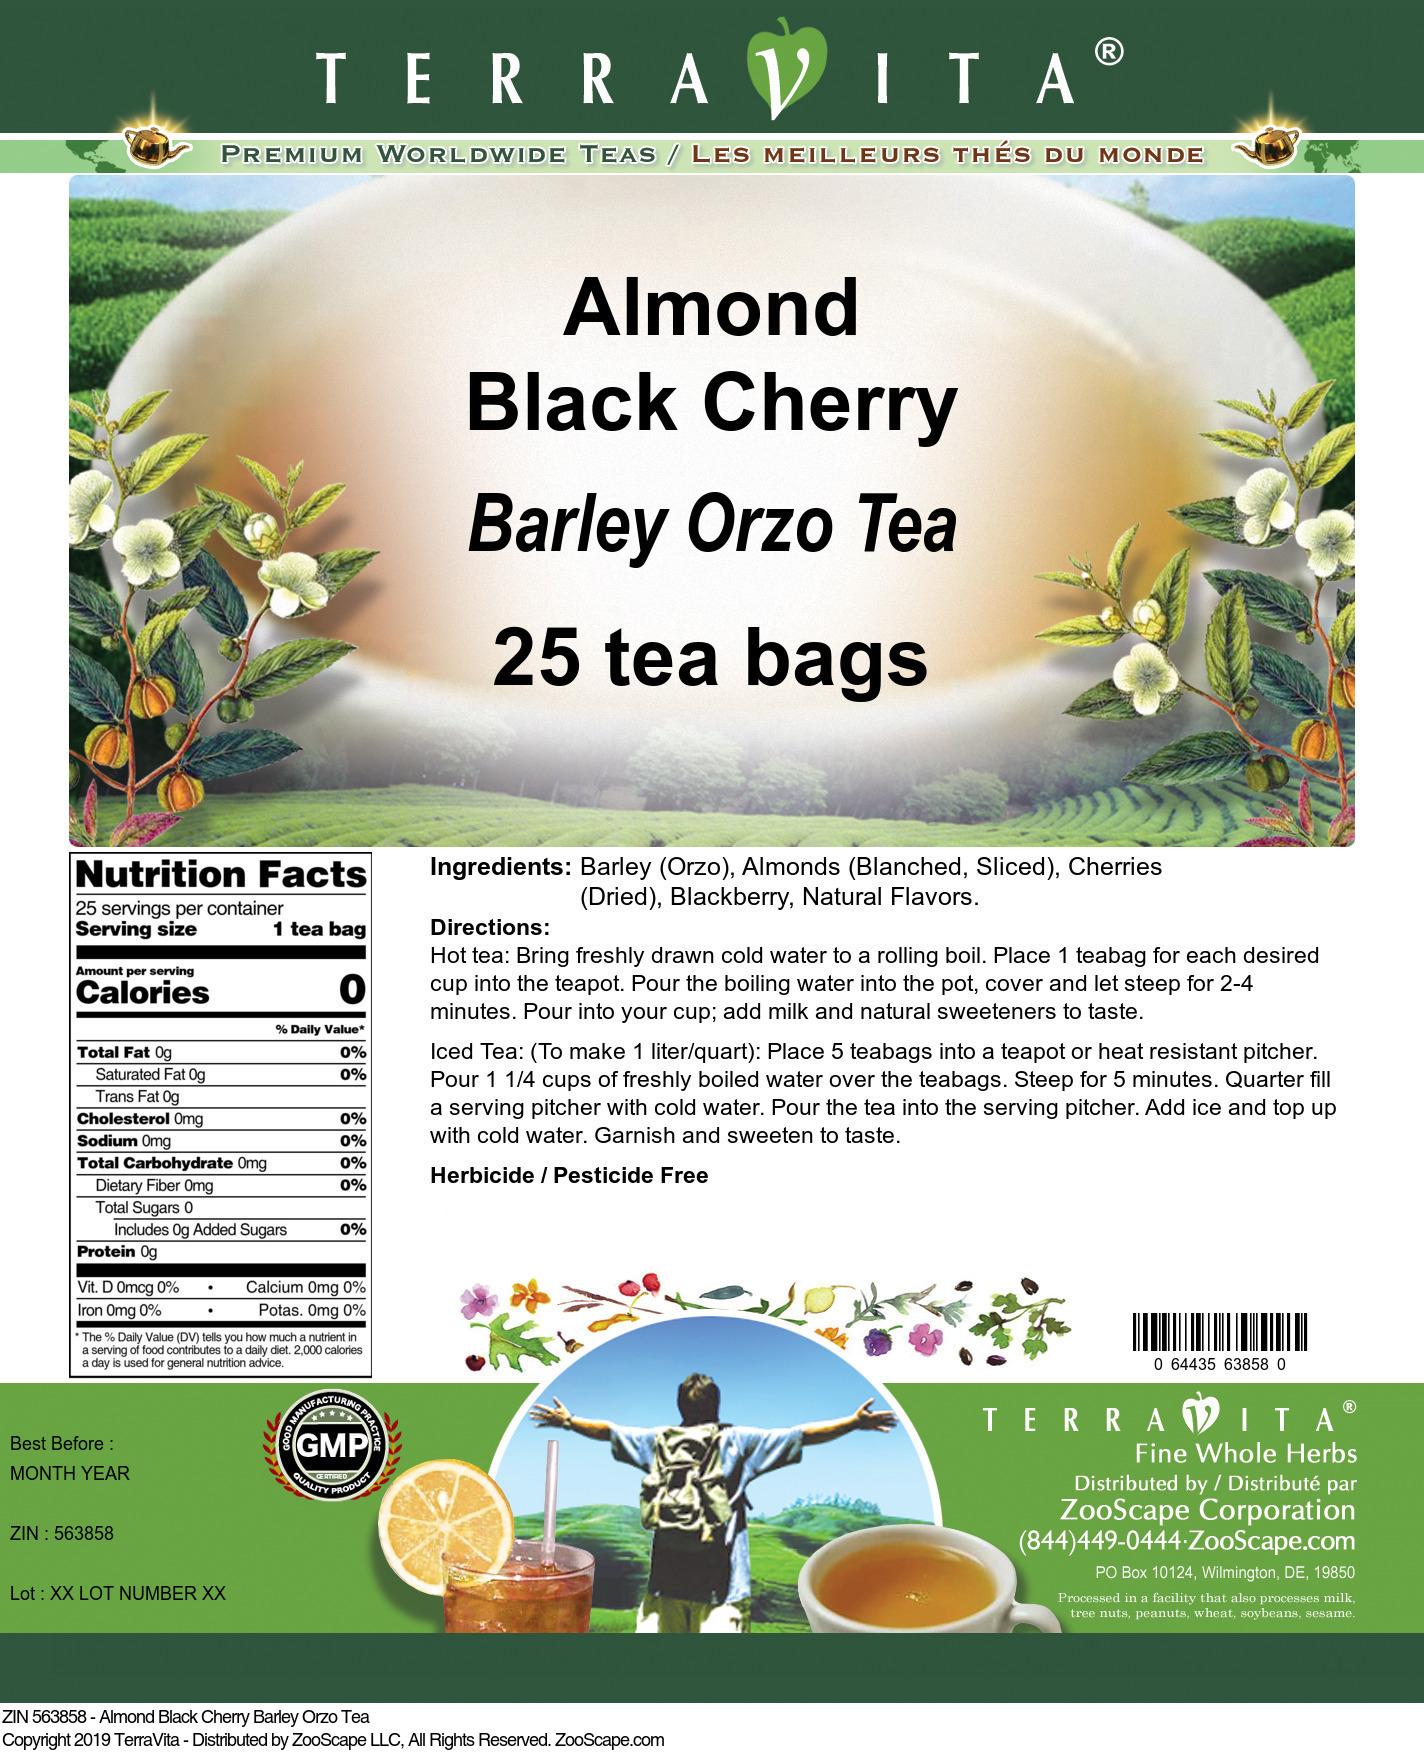 Almond Black Cherry Barley Orzo